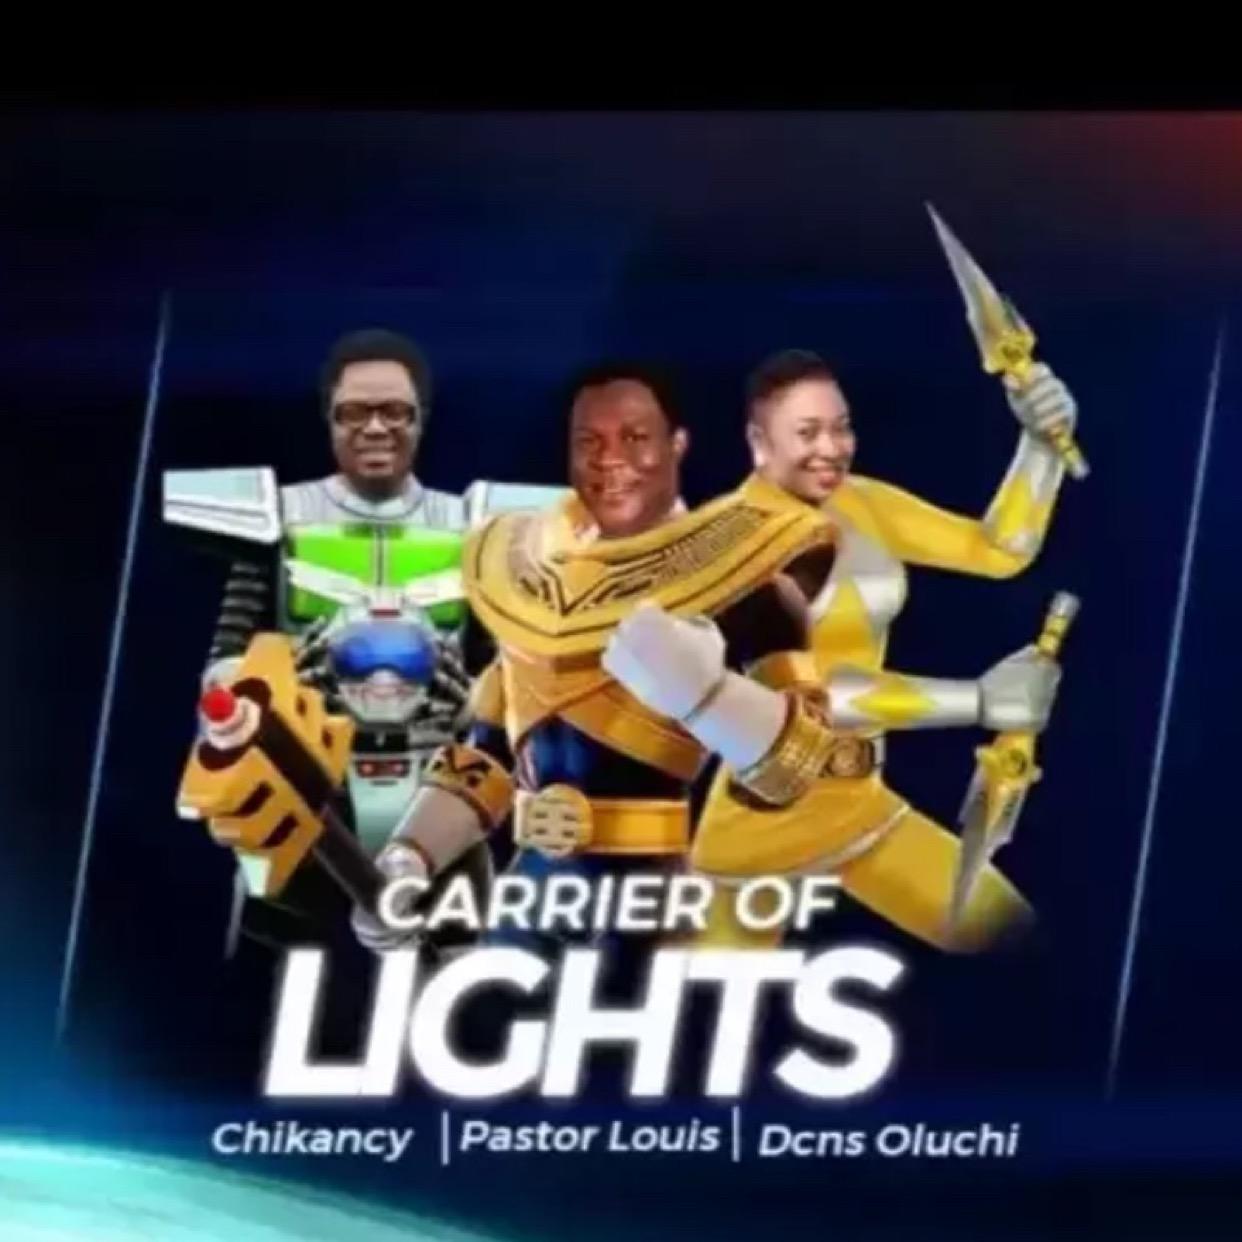 My Boss💃🏼💃🏼💃🏼💃🏼💃🏼💃🏼 Carriers of Light